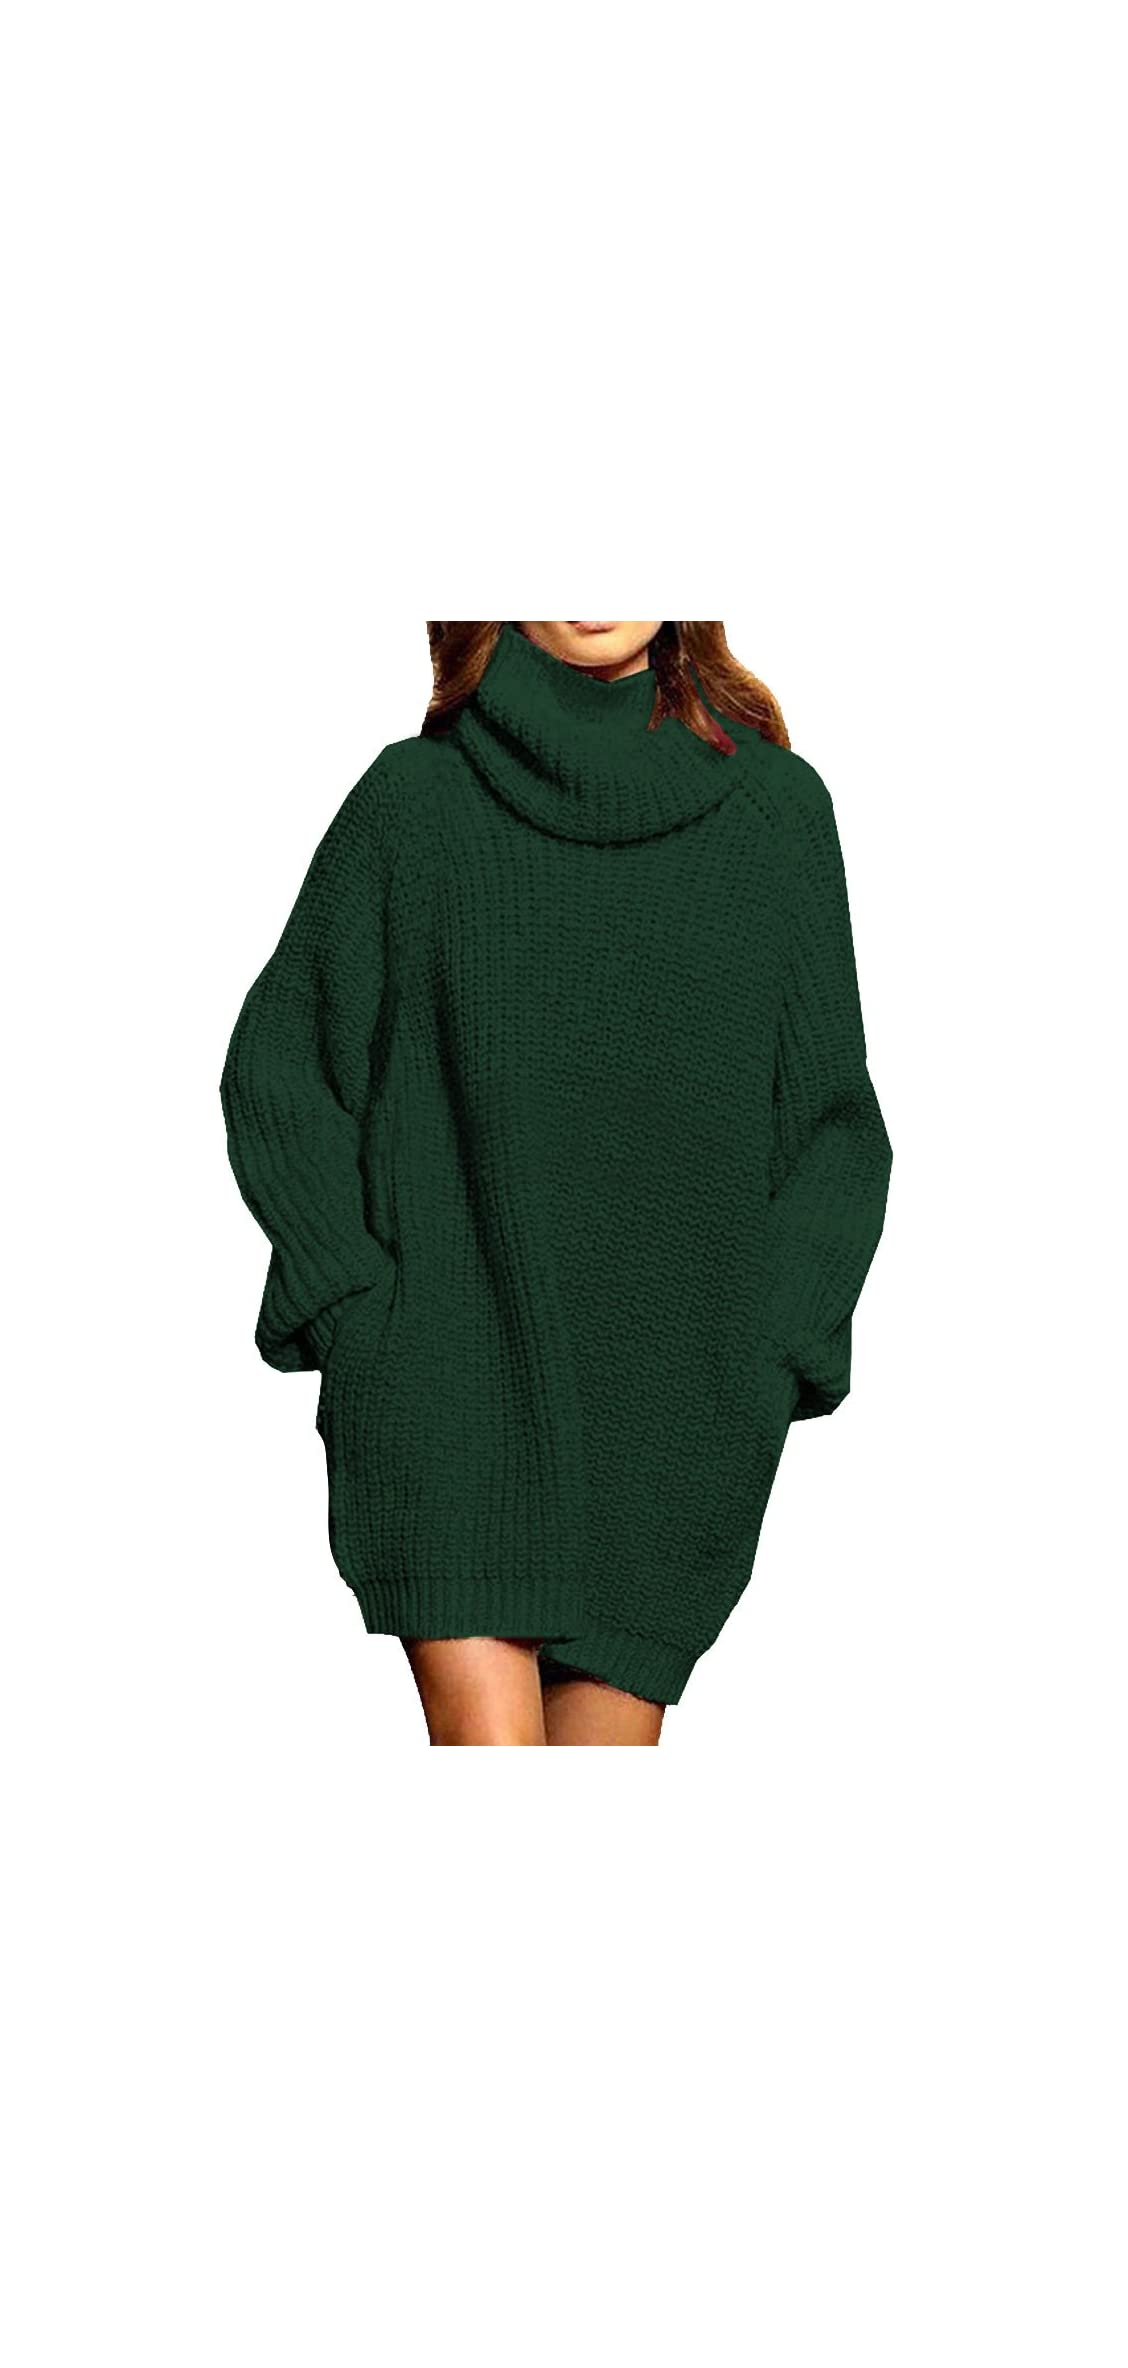 Women's Loose Oversize Turtleneck Wool Long Pullover